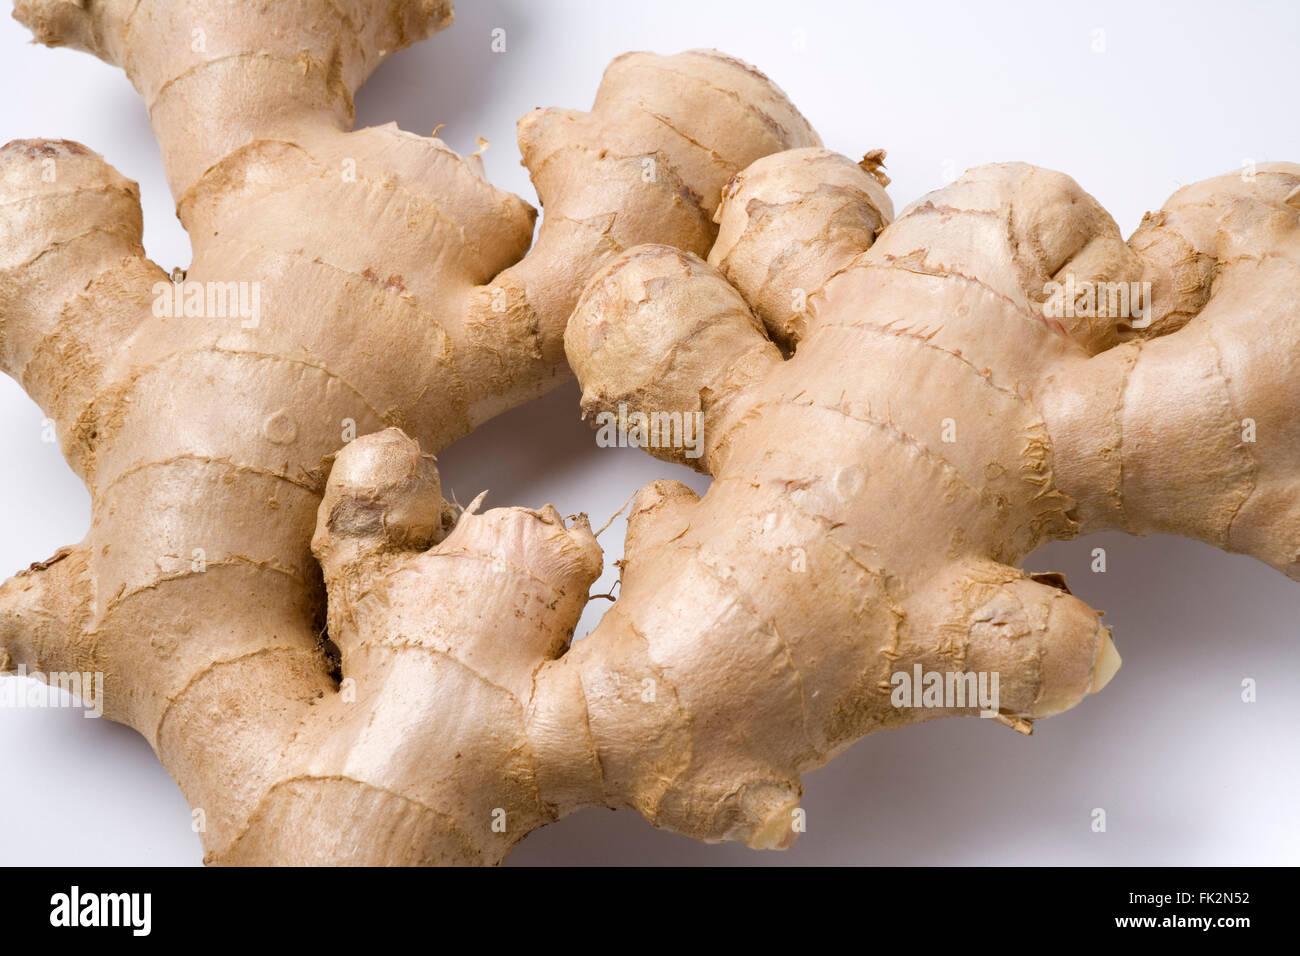 Fresh Ginger roots on white background - Stock Image